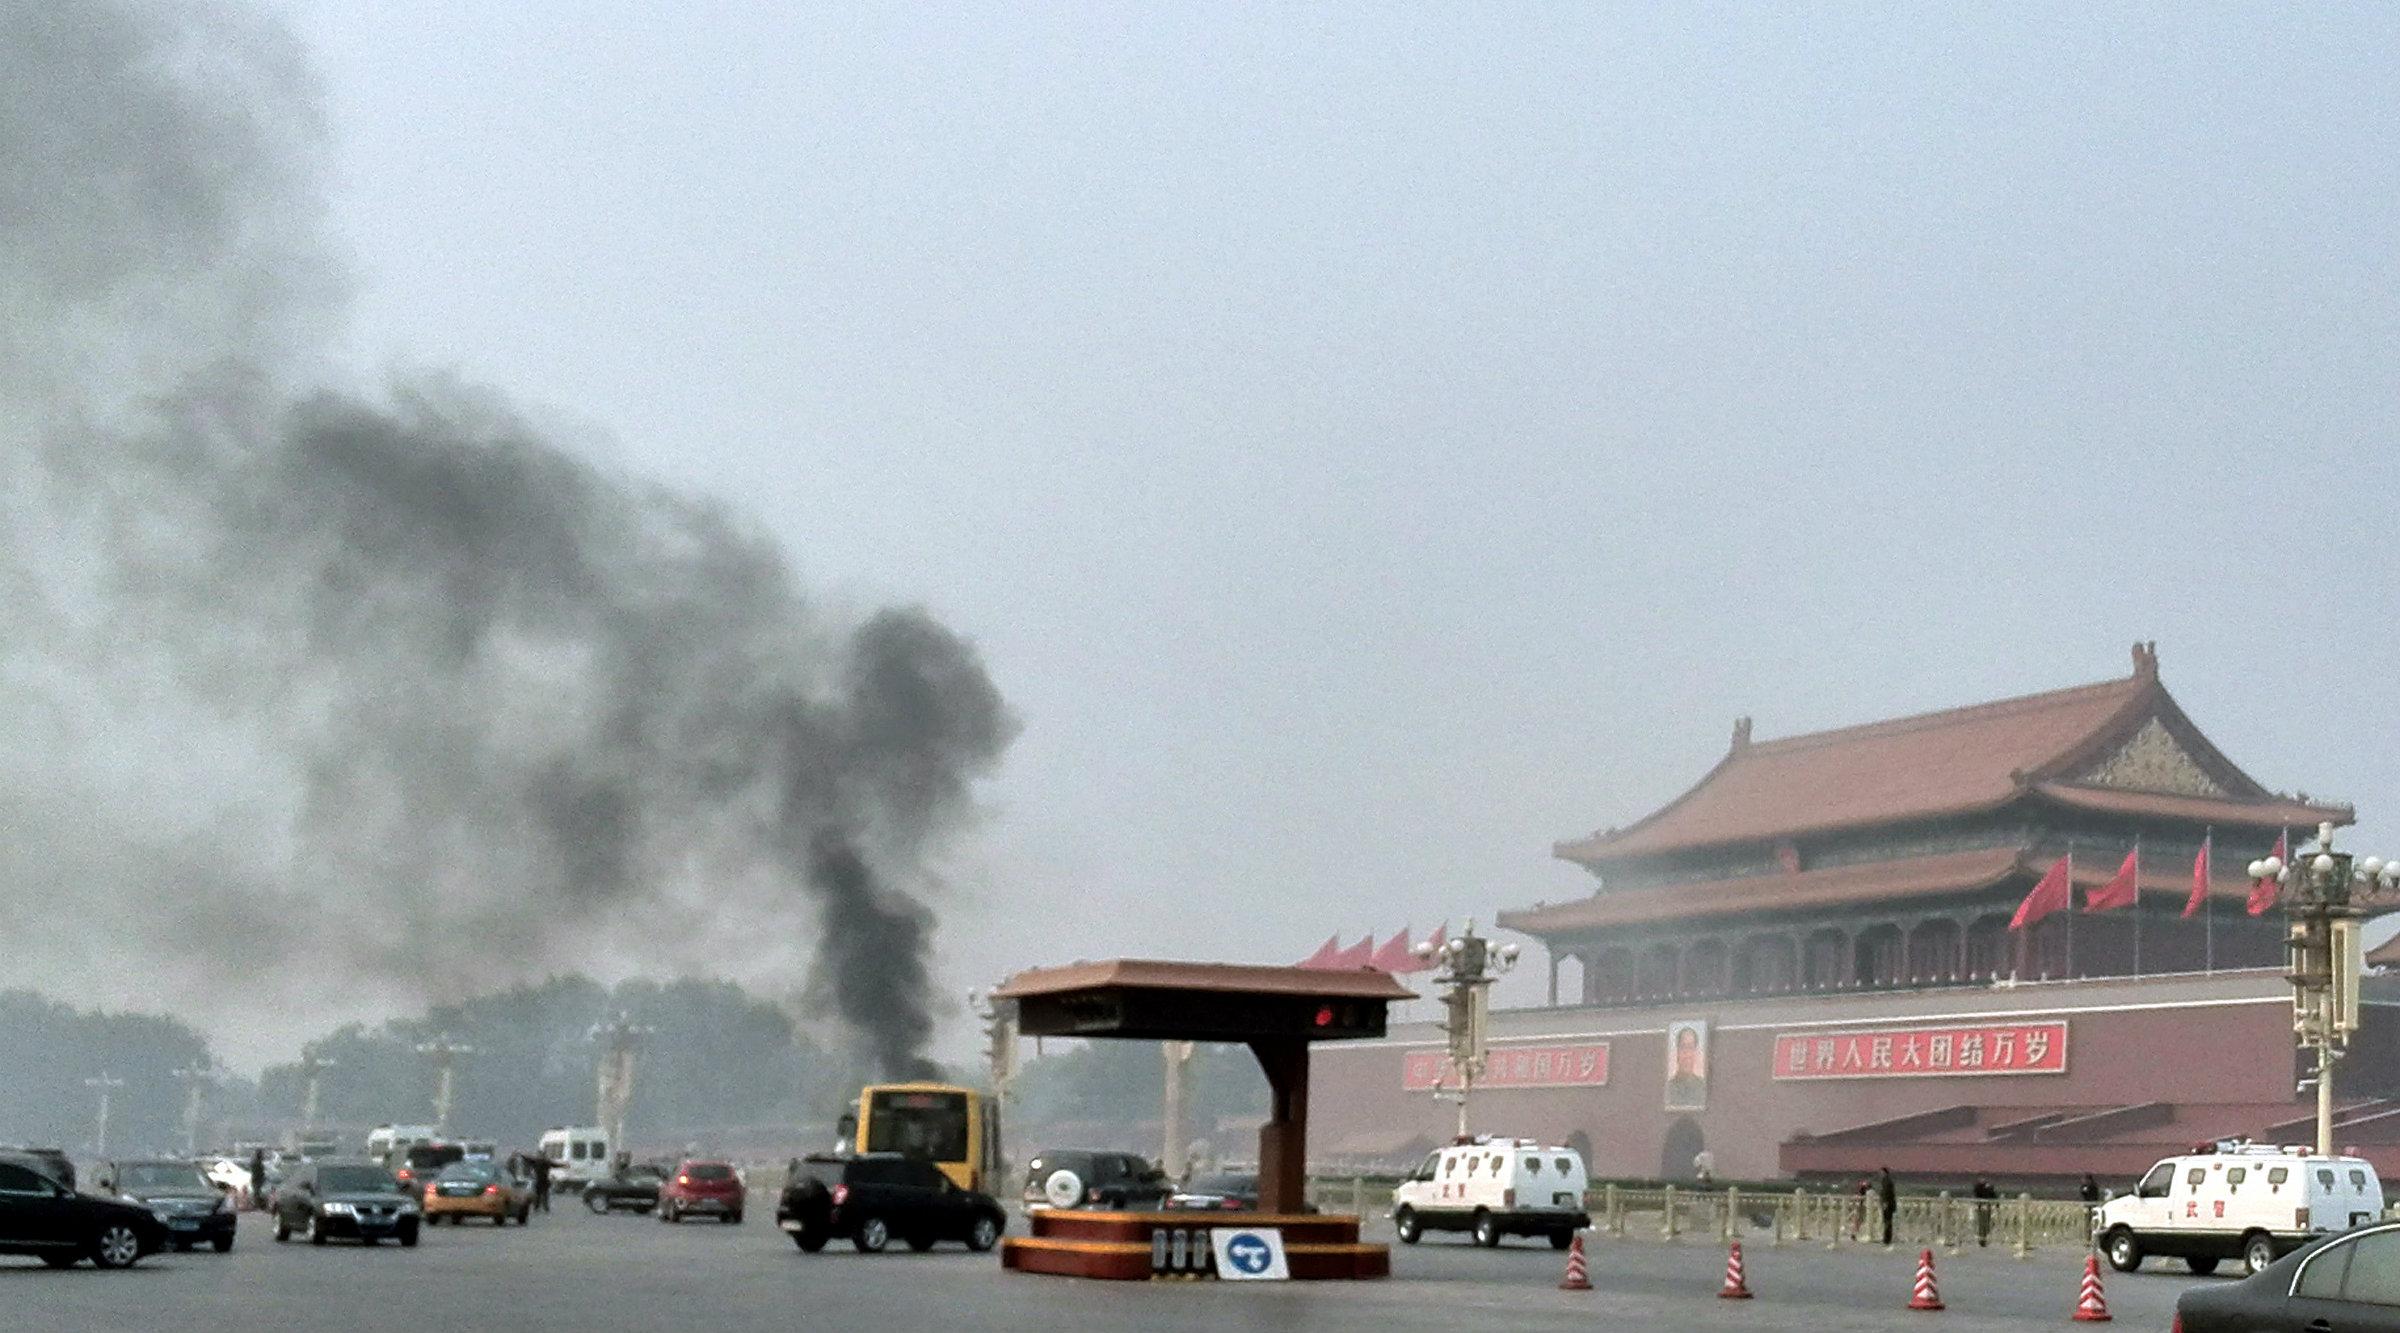 Tiananmen Square on Oct. 28, 2013.